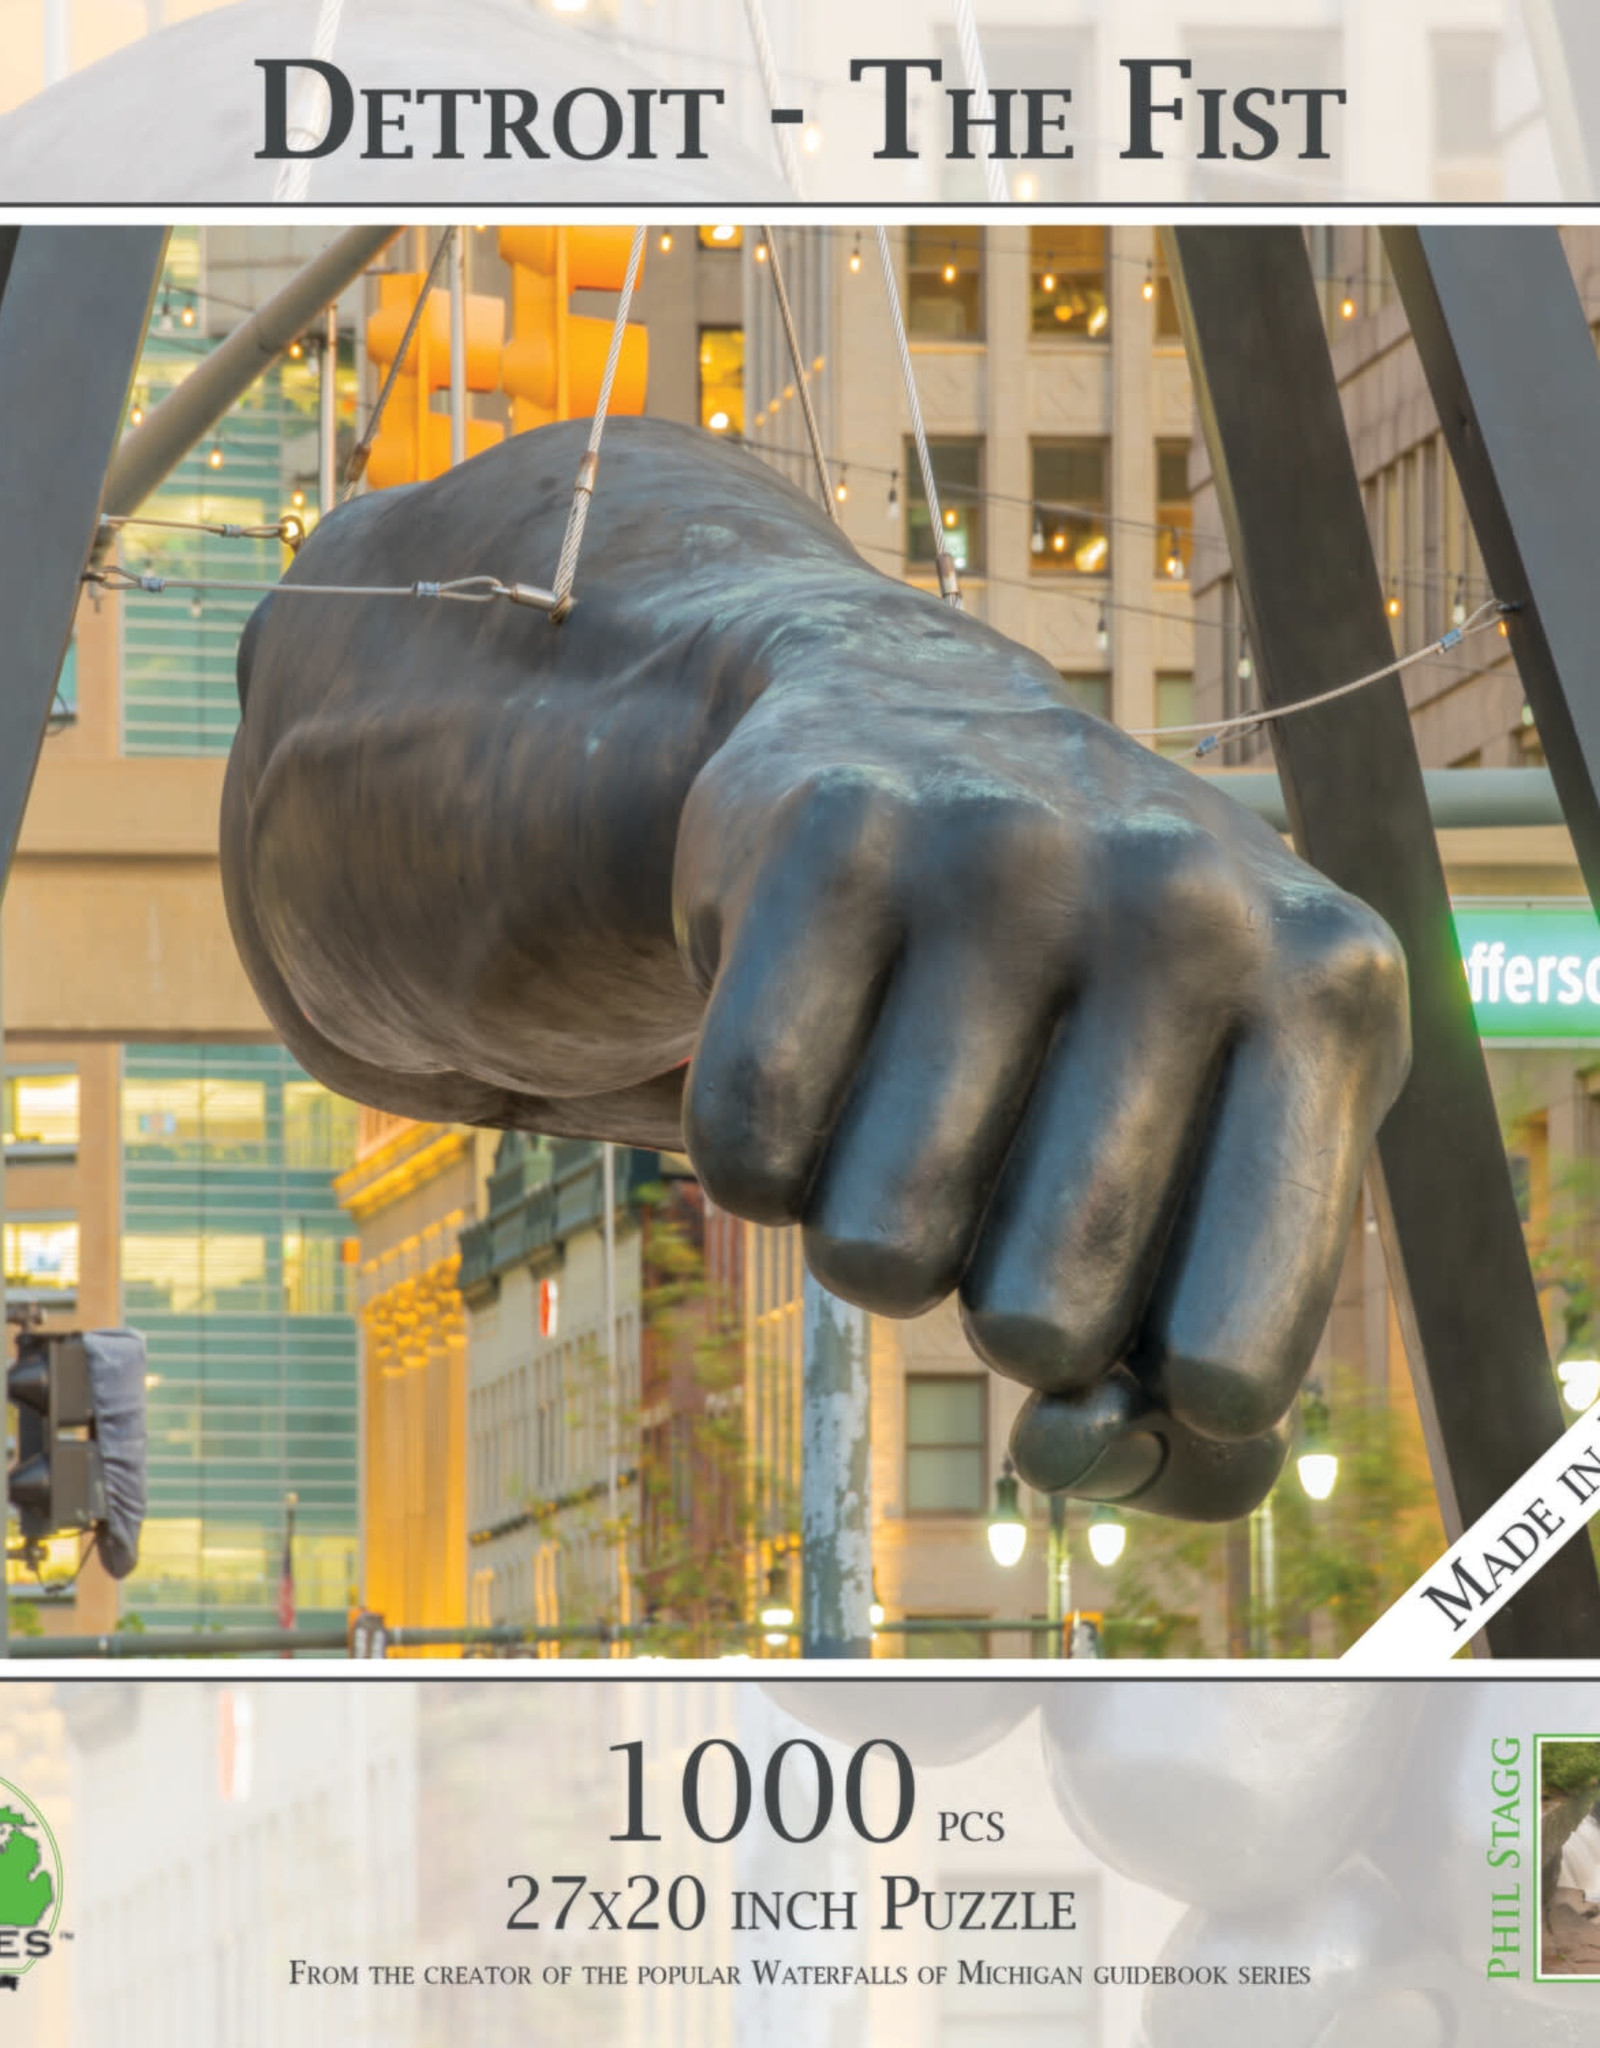 MI Puzzles 1000pc The Fist